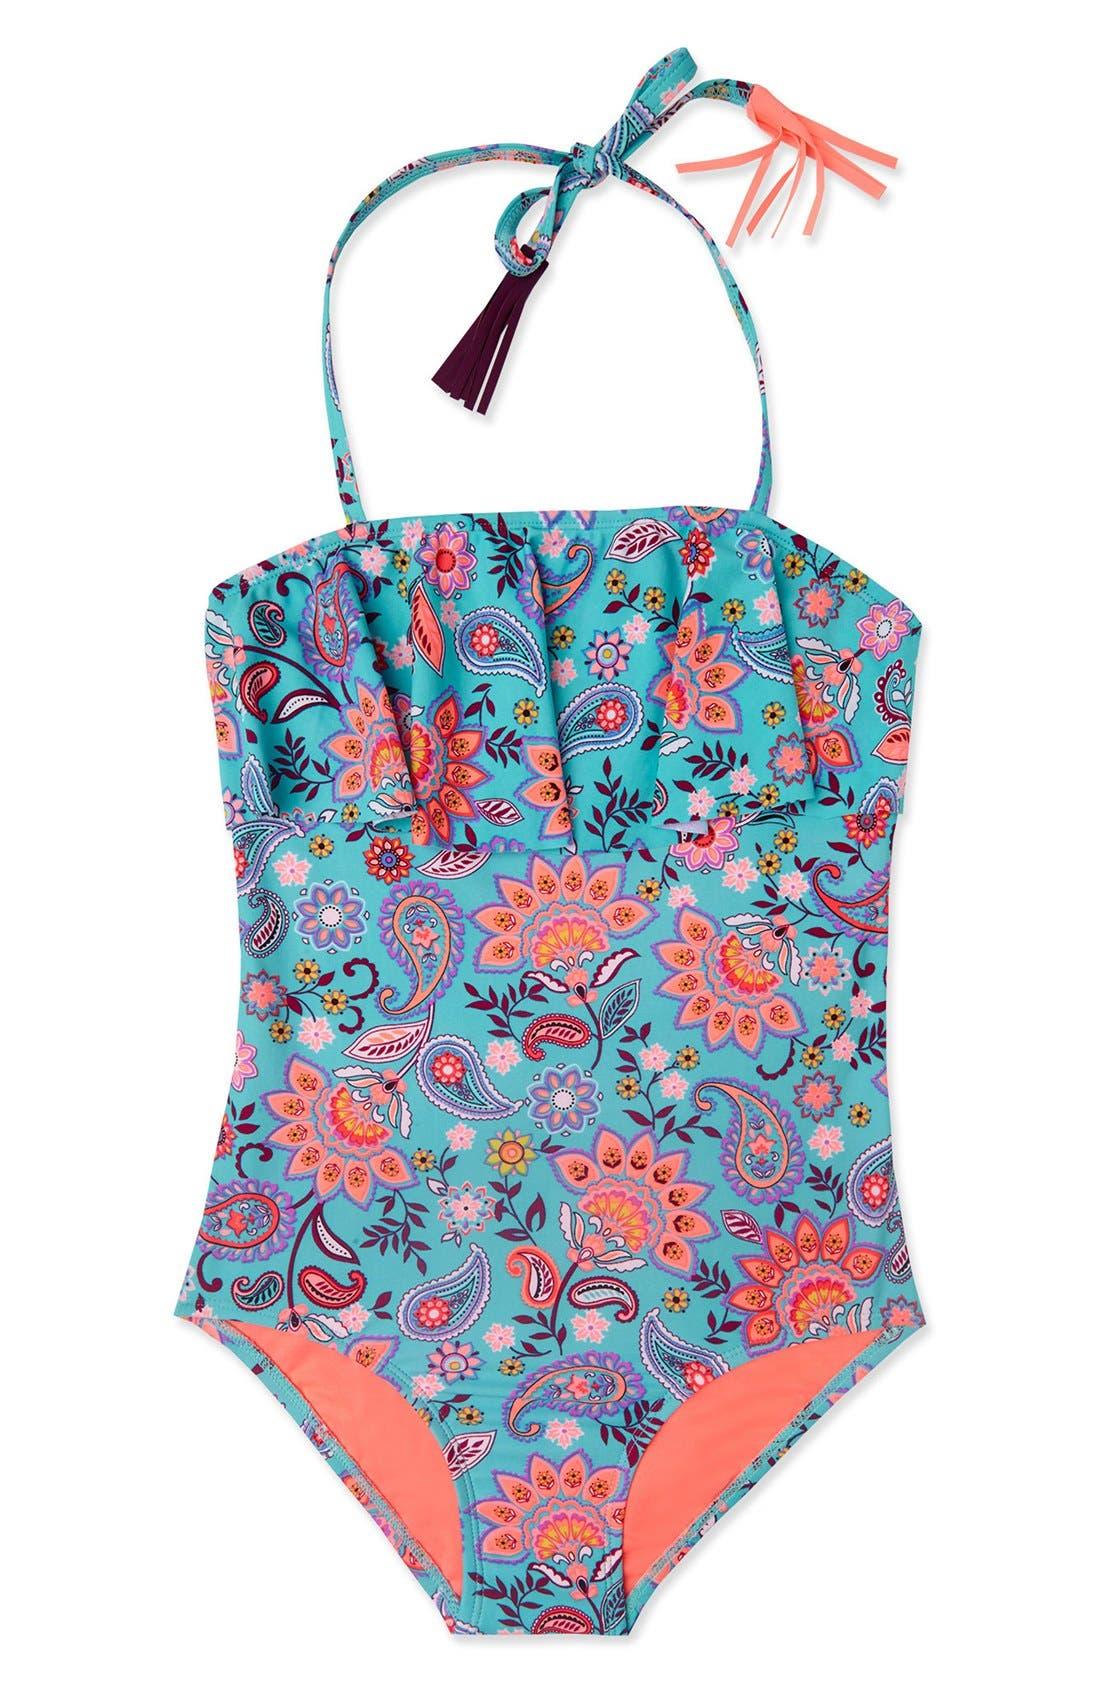 Main Image - Gossip Girl 'Le Corsaire' Print One-Piece Swimsuit (Big Girls)